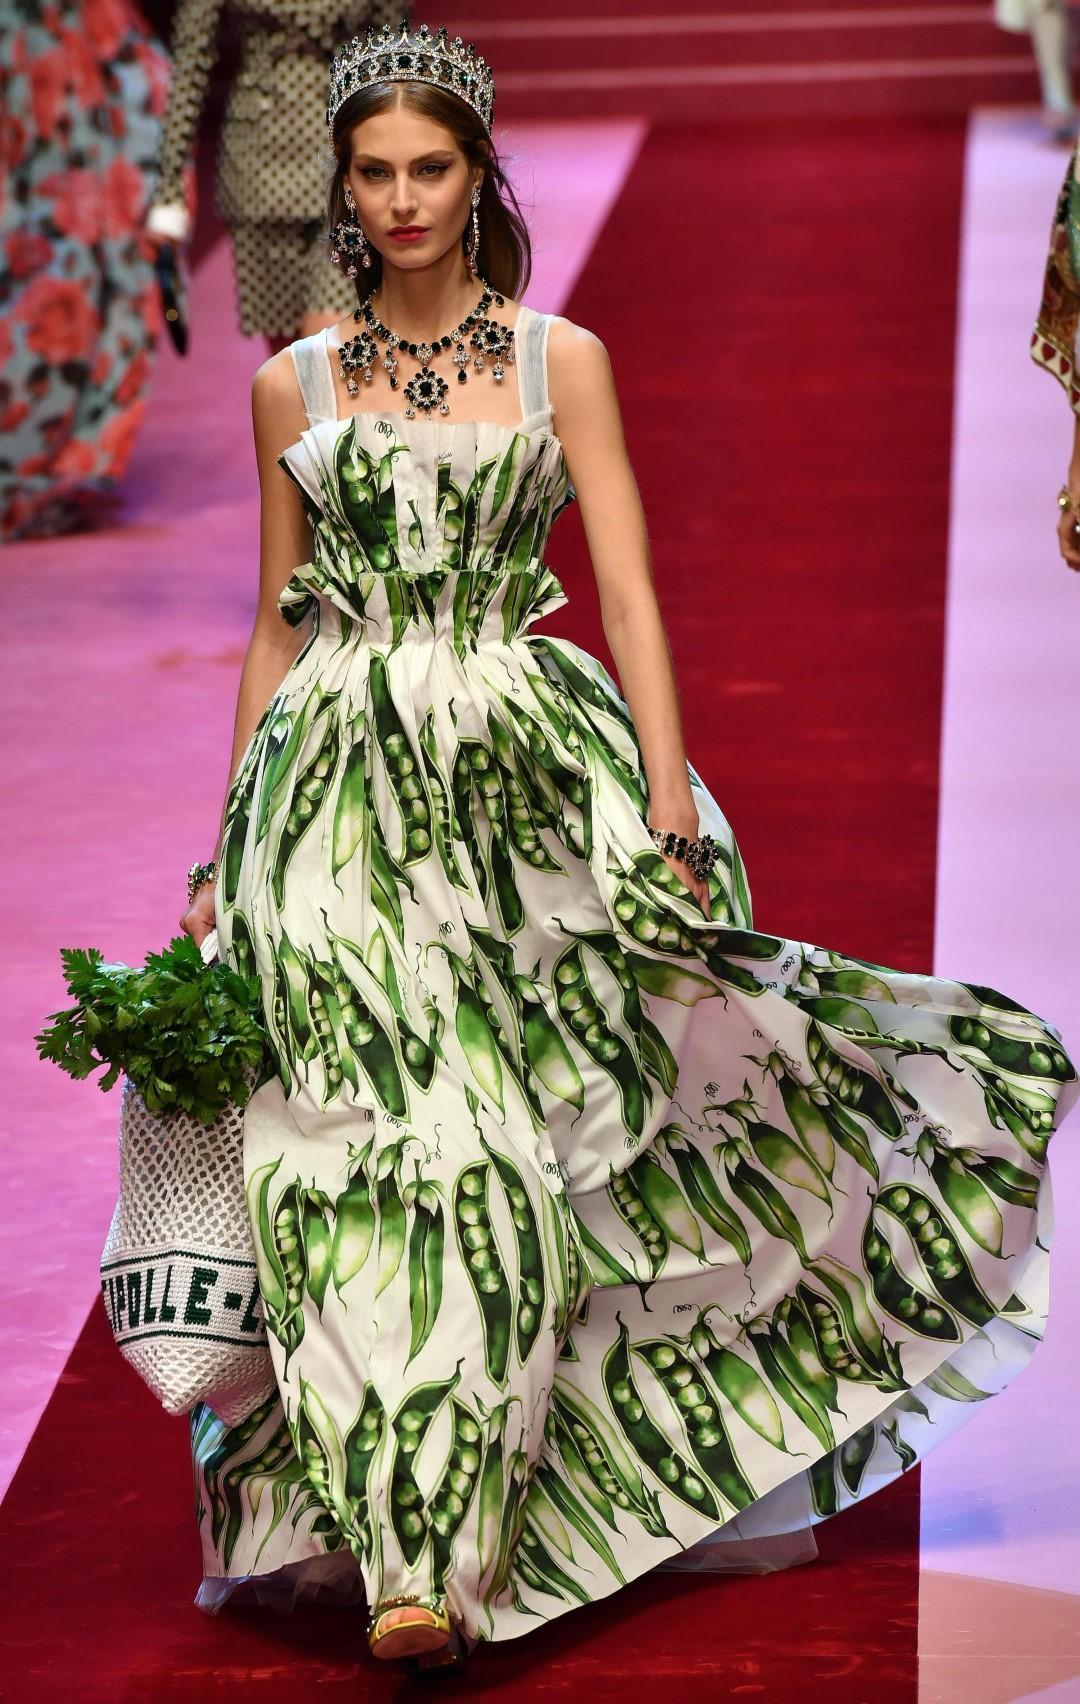 Dolce e Gabbana  la donna come Regina di cuori - Tgcom24 b20380c8ca9